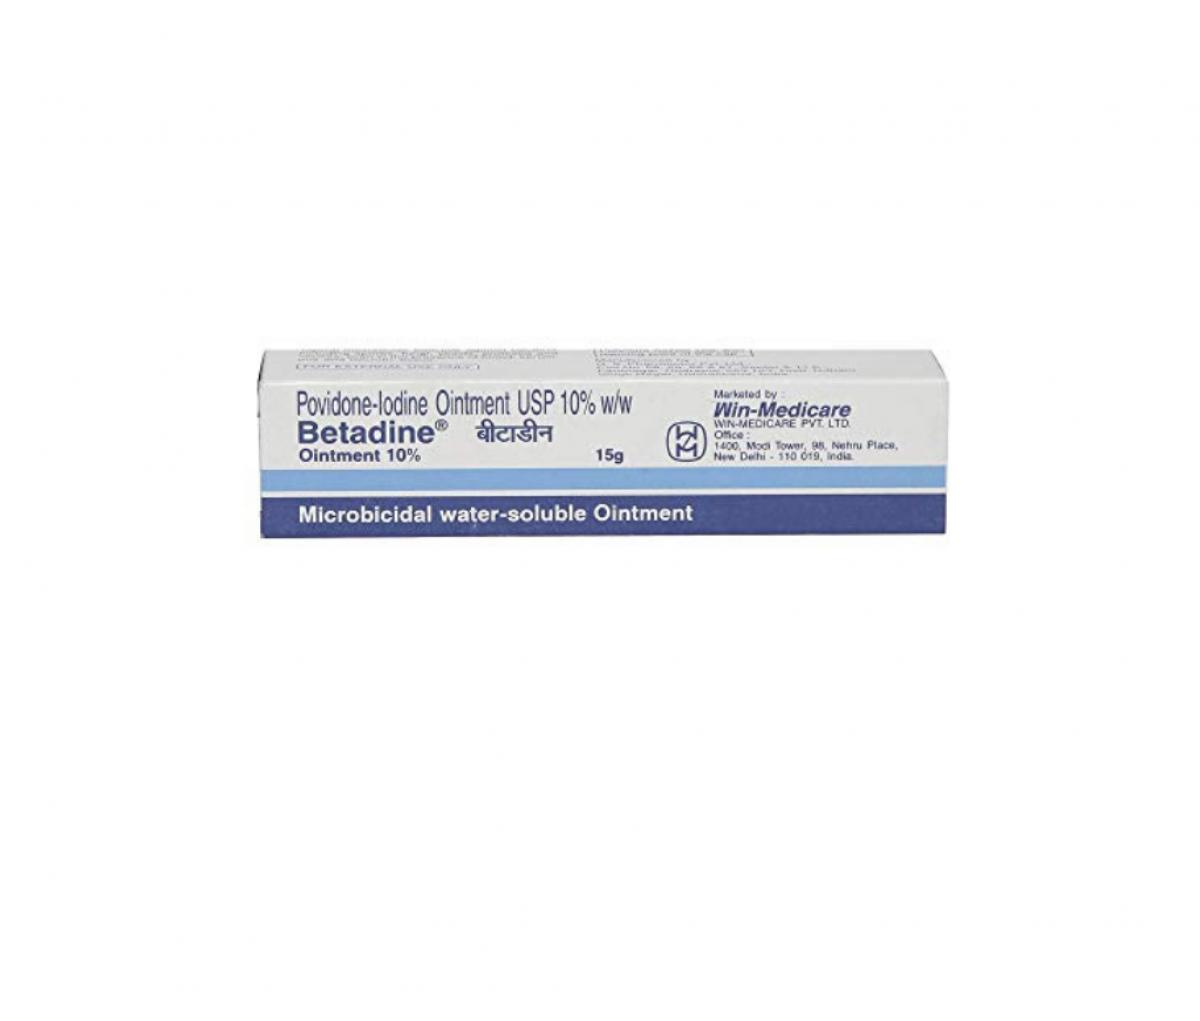 Betadine 10% Ointment 15g